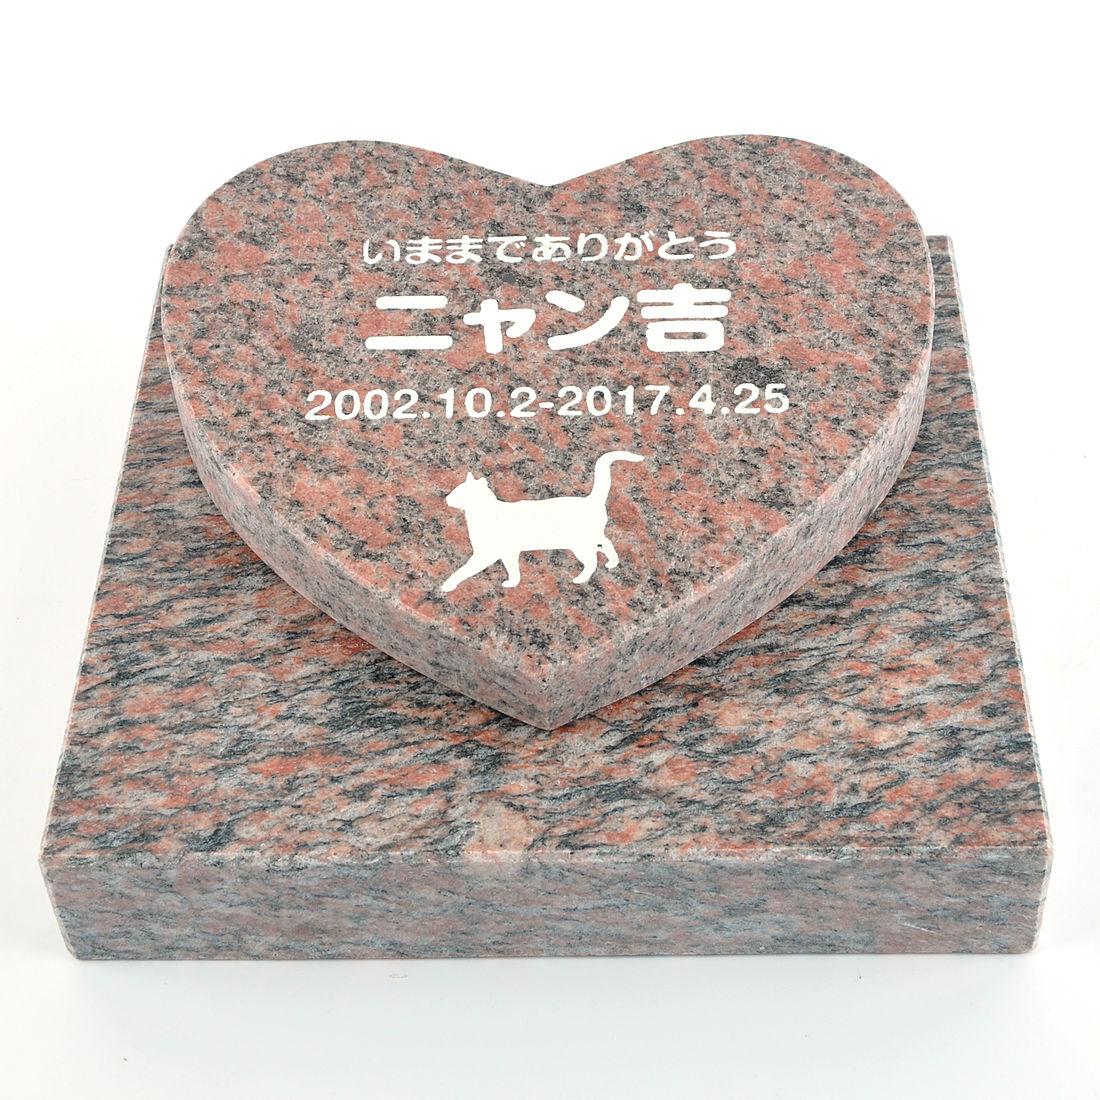 Pet&Love. ペットのお墓 天然石製 セット型 底板が厚く重いタイプ 御影石 レッド ハート  【HLS_DU】【楽ギフ_名入れ】 attr177attr ctgr2ctgr sml3sml+ctgr2ctgr CAT